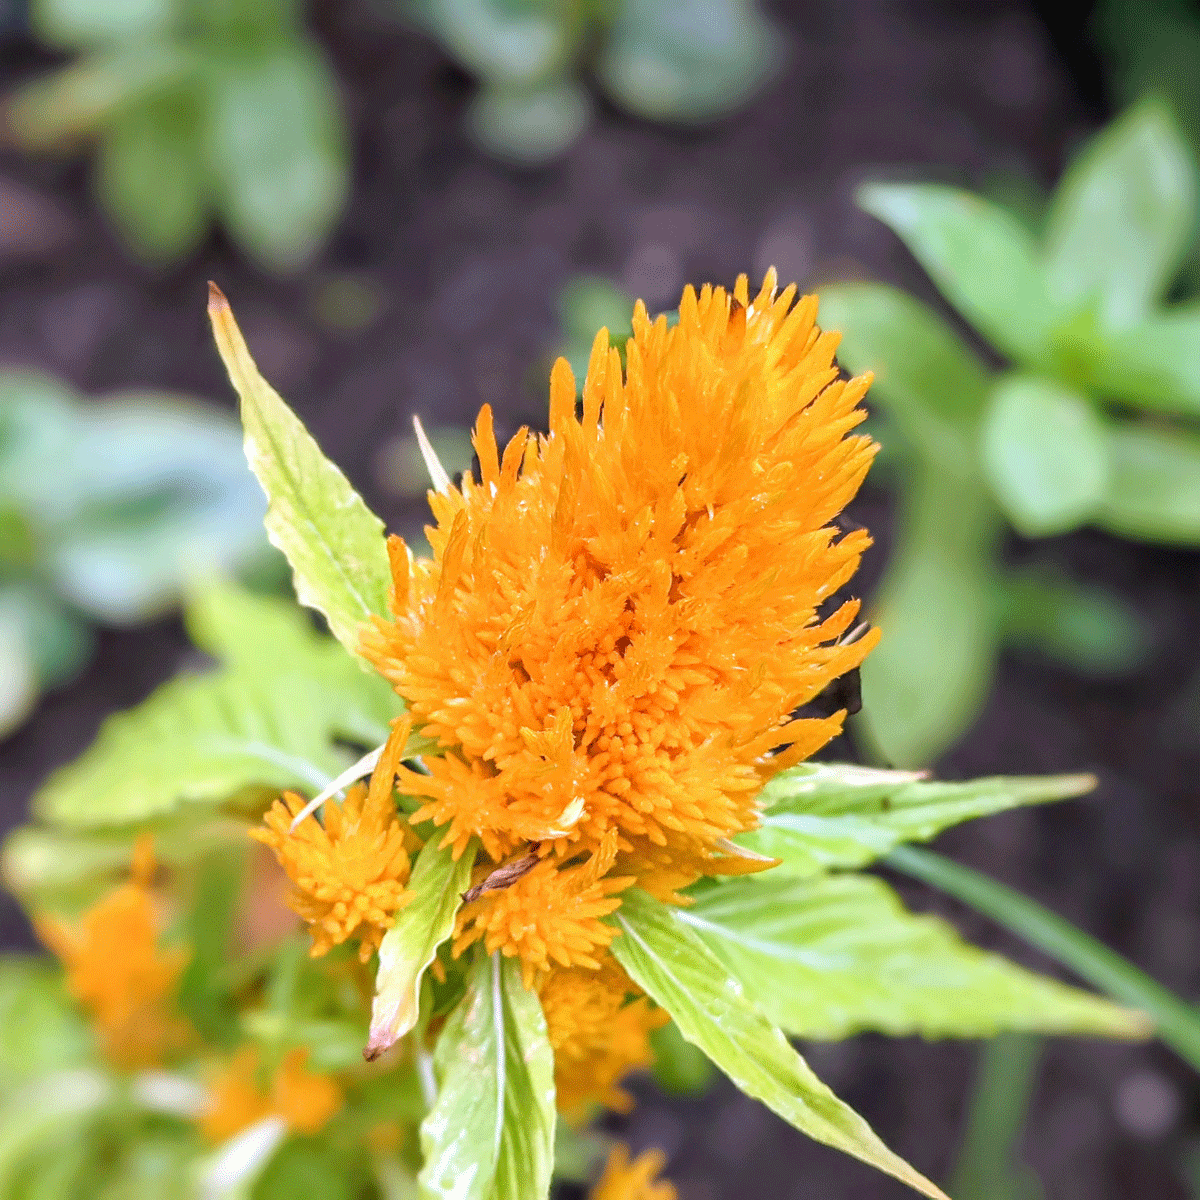 Golden Yellow Celosia Plant in my garden